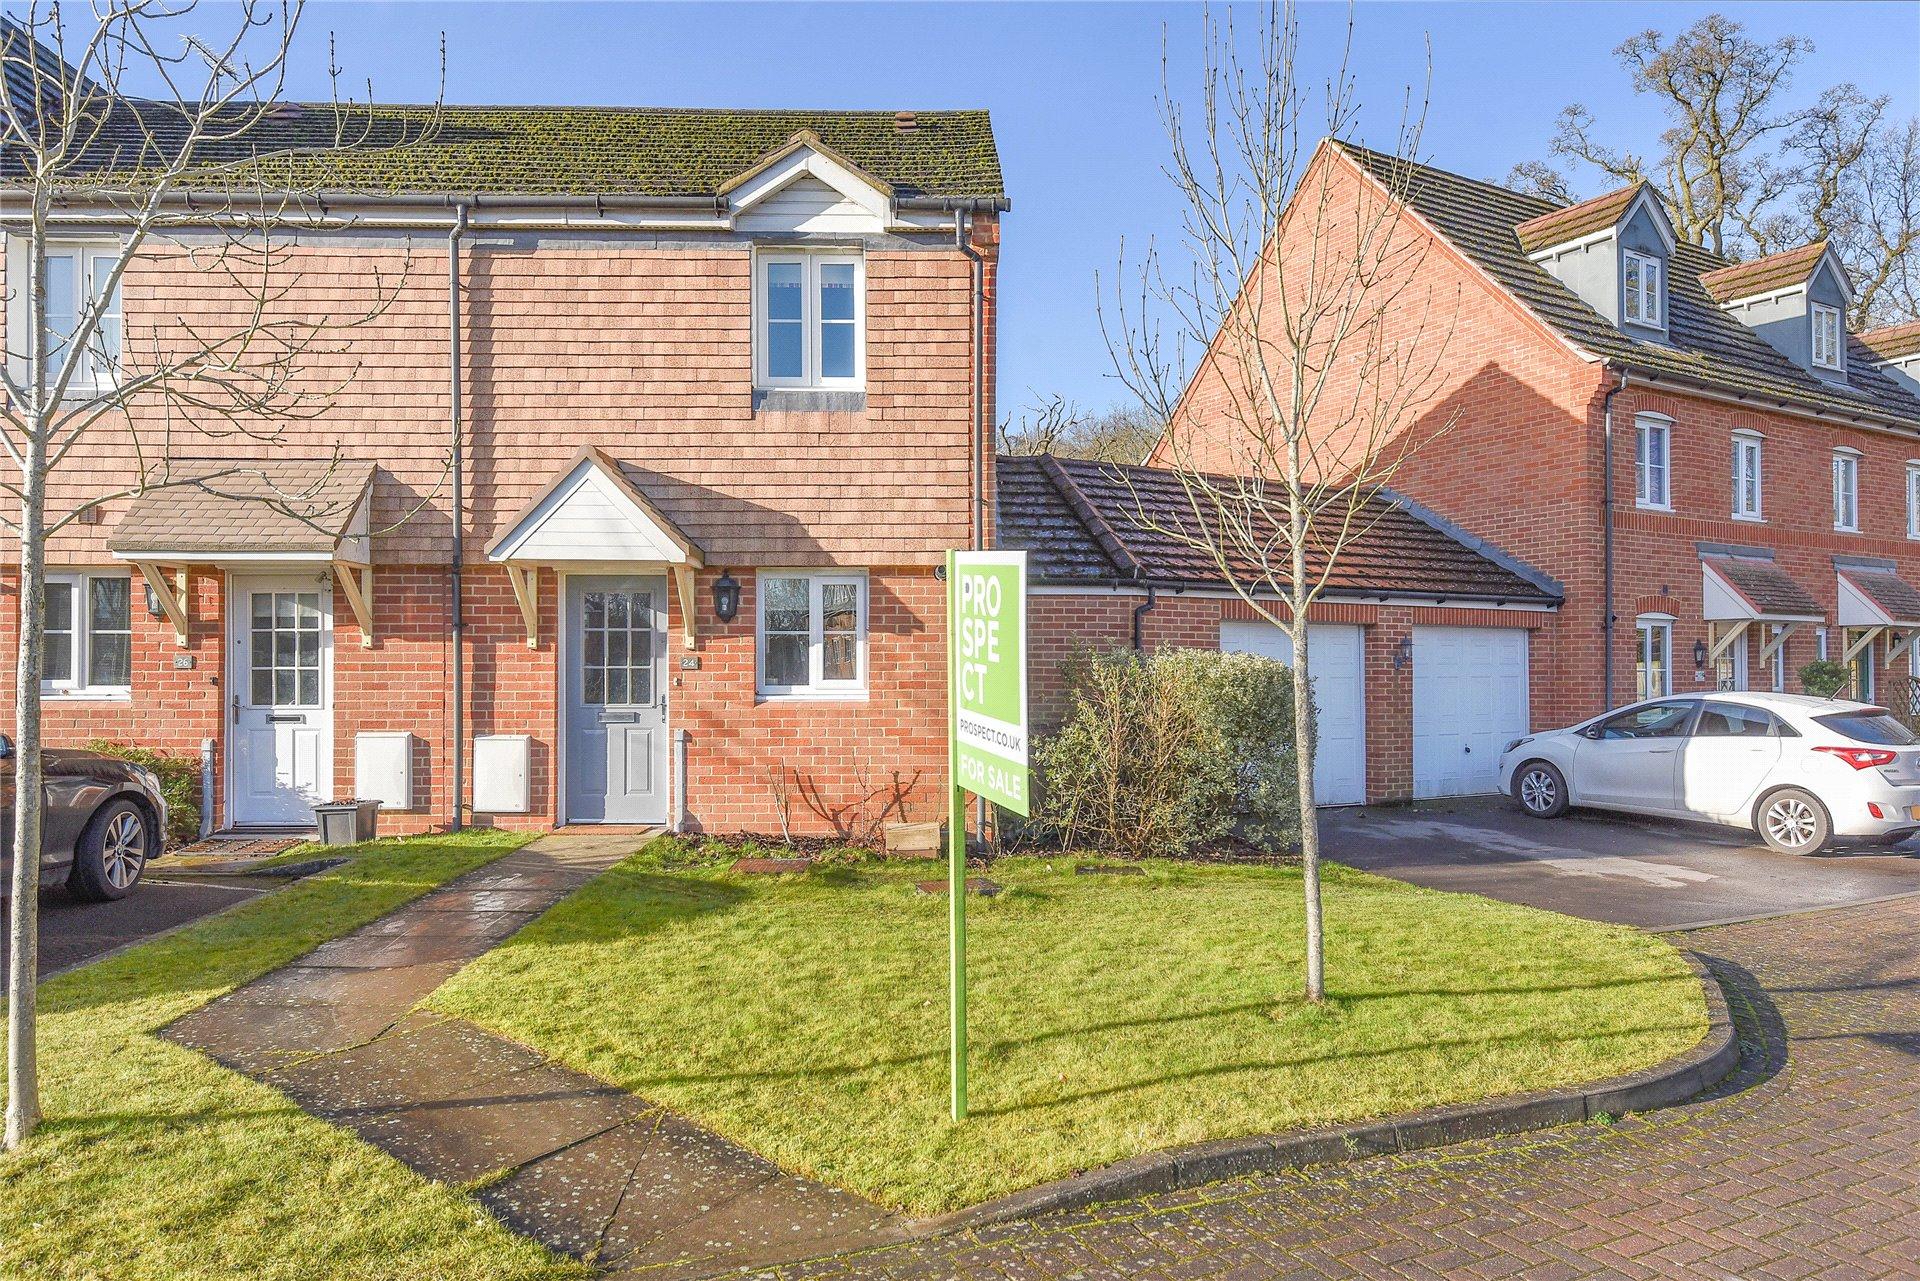 2 Bedrooms Terraced House for sale in Poperinghe Way, Arborfield, Reading, Berkshire, RG2